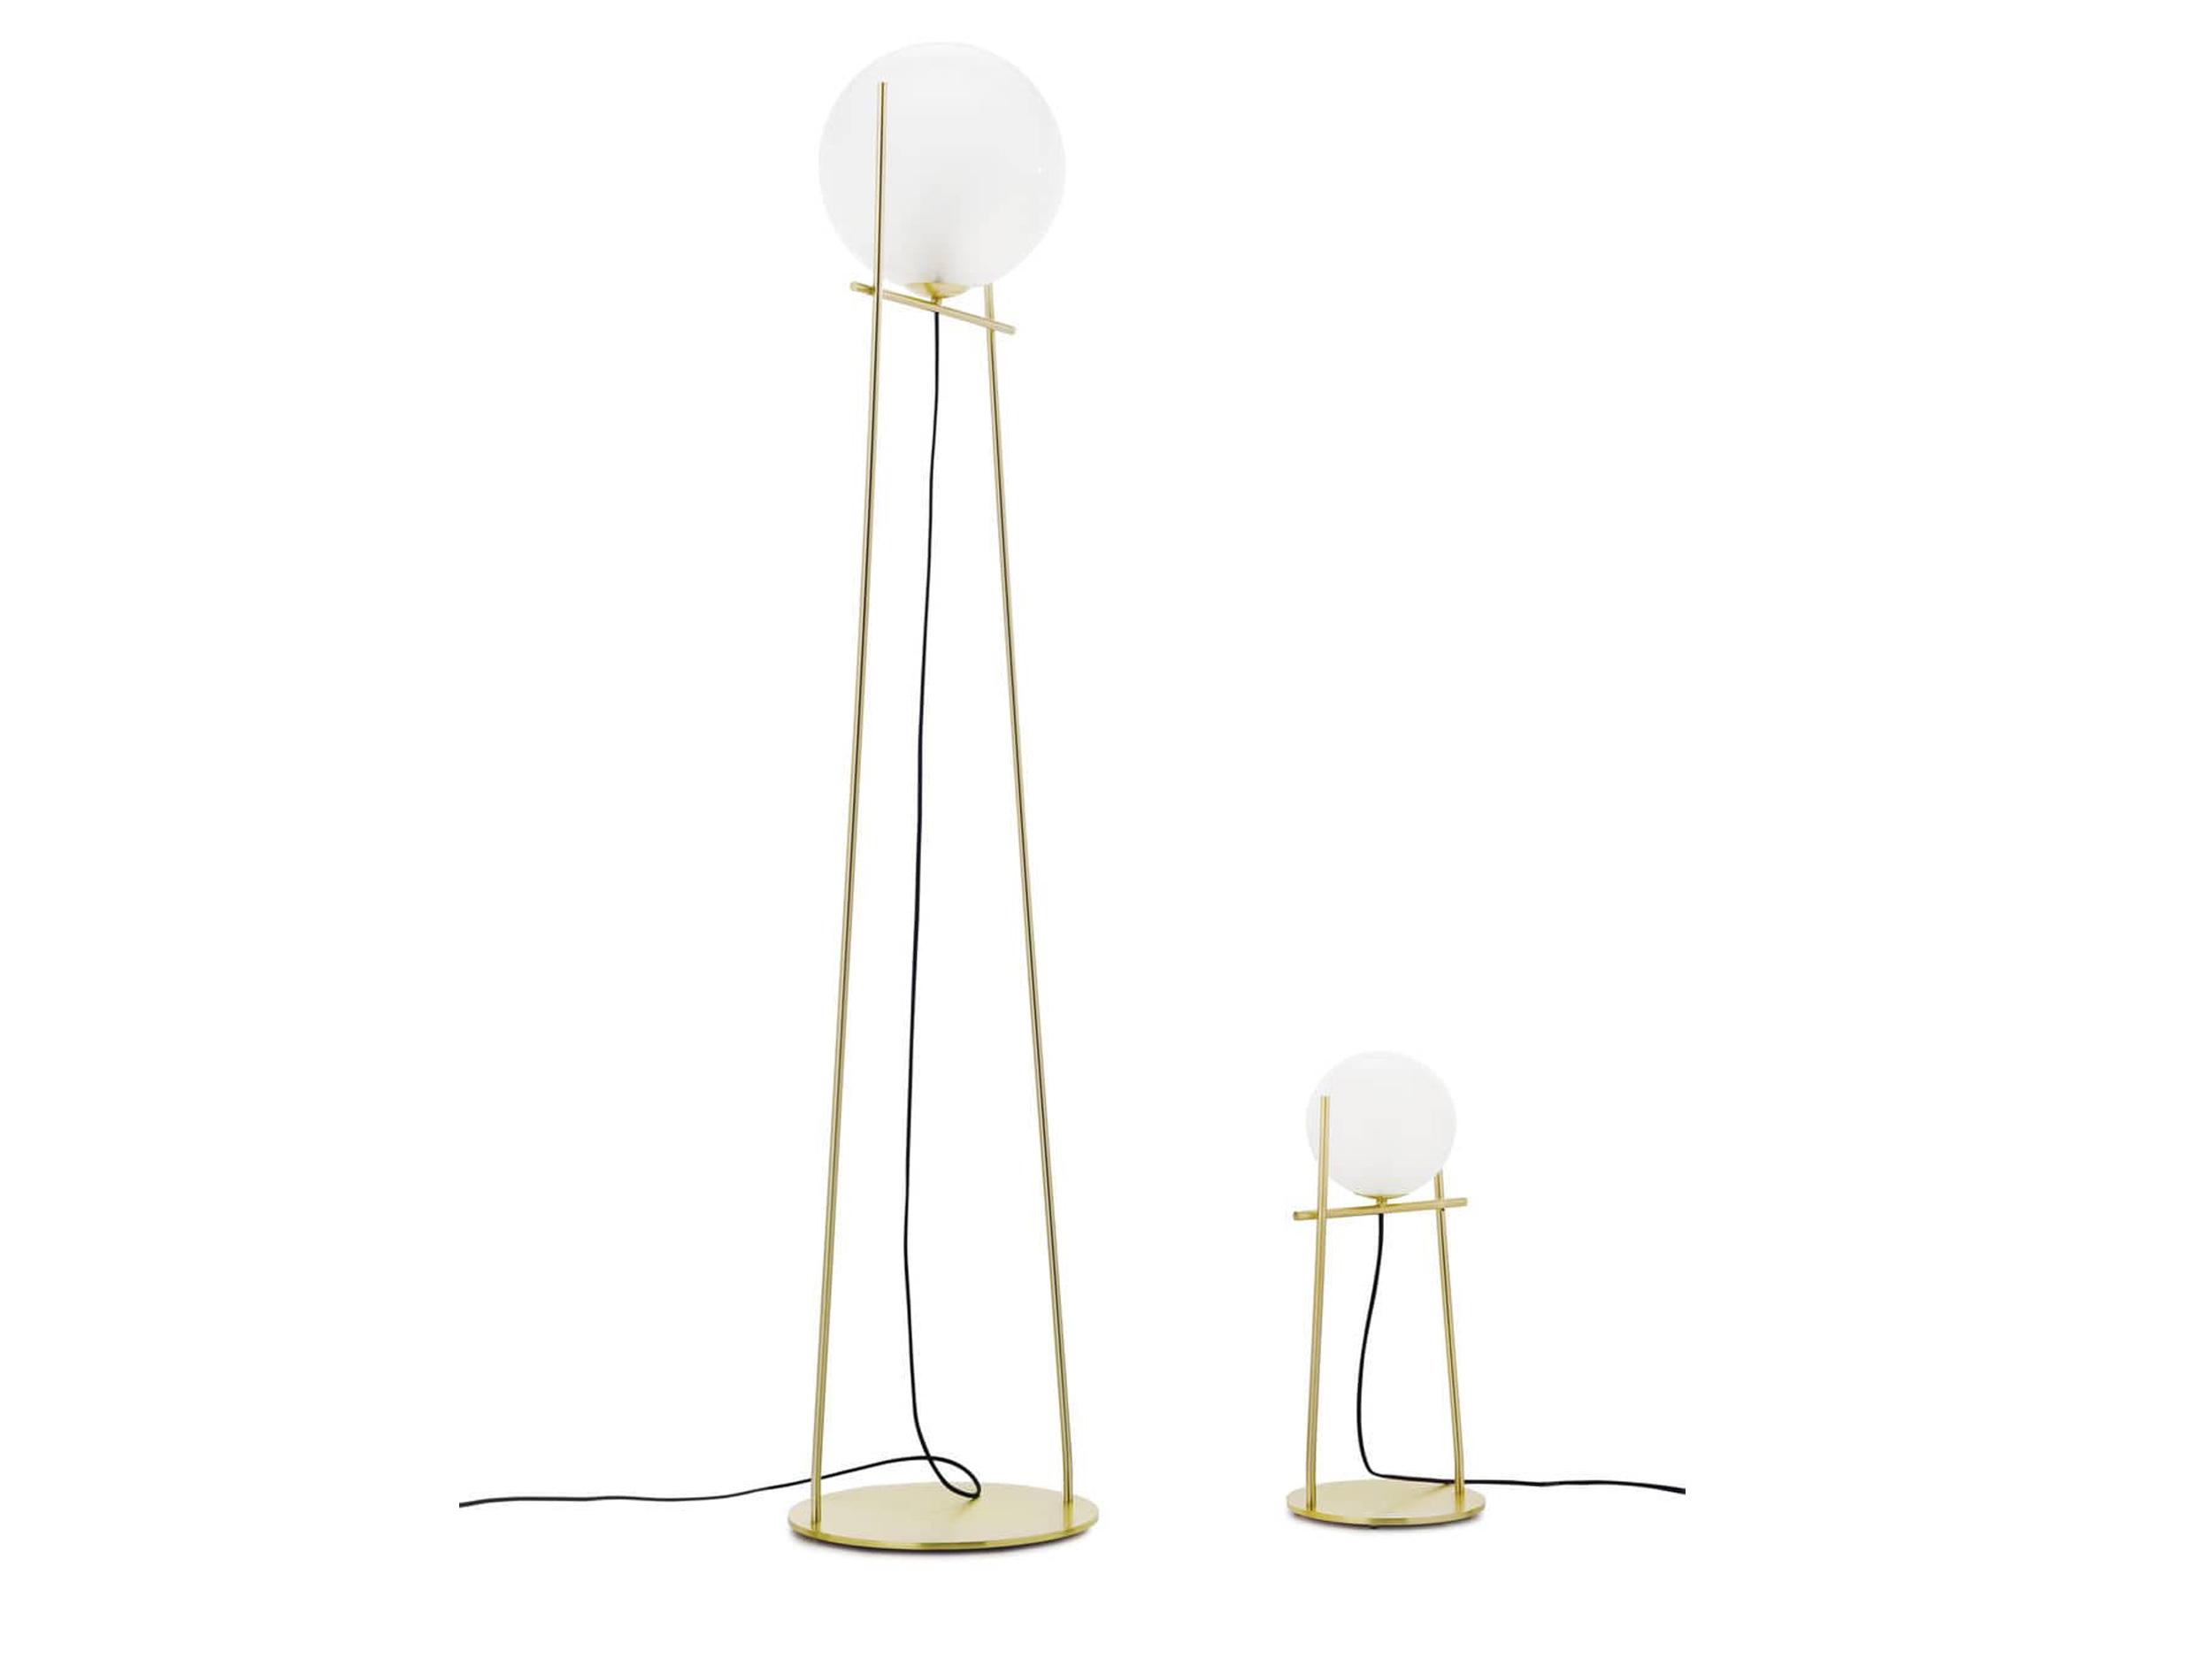 Tondina Lamp